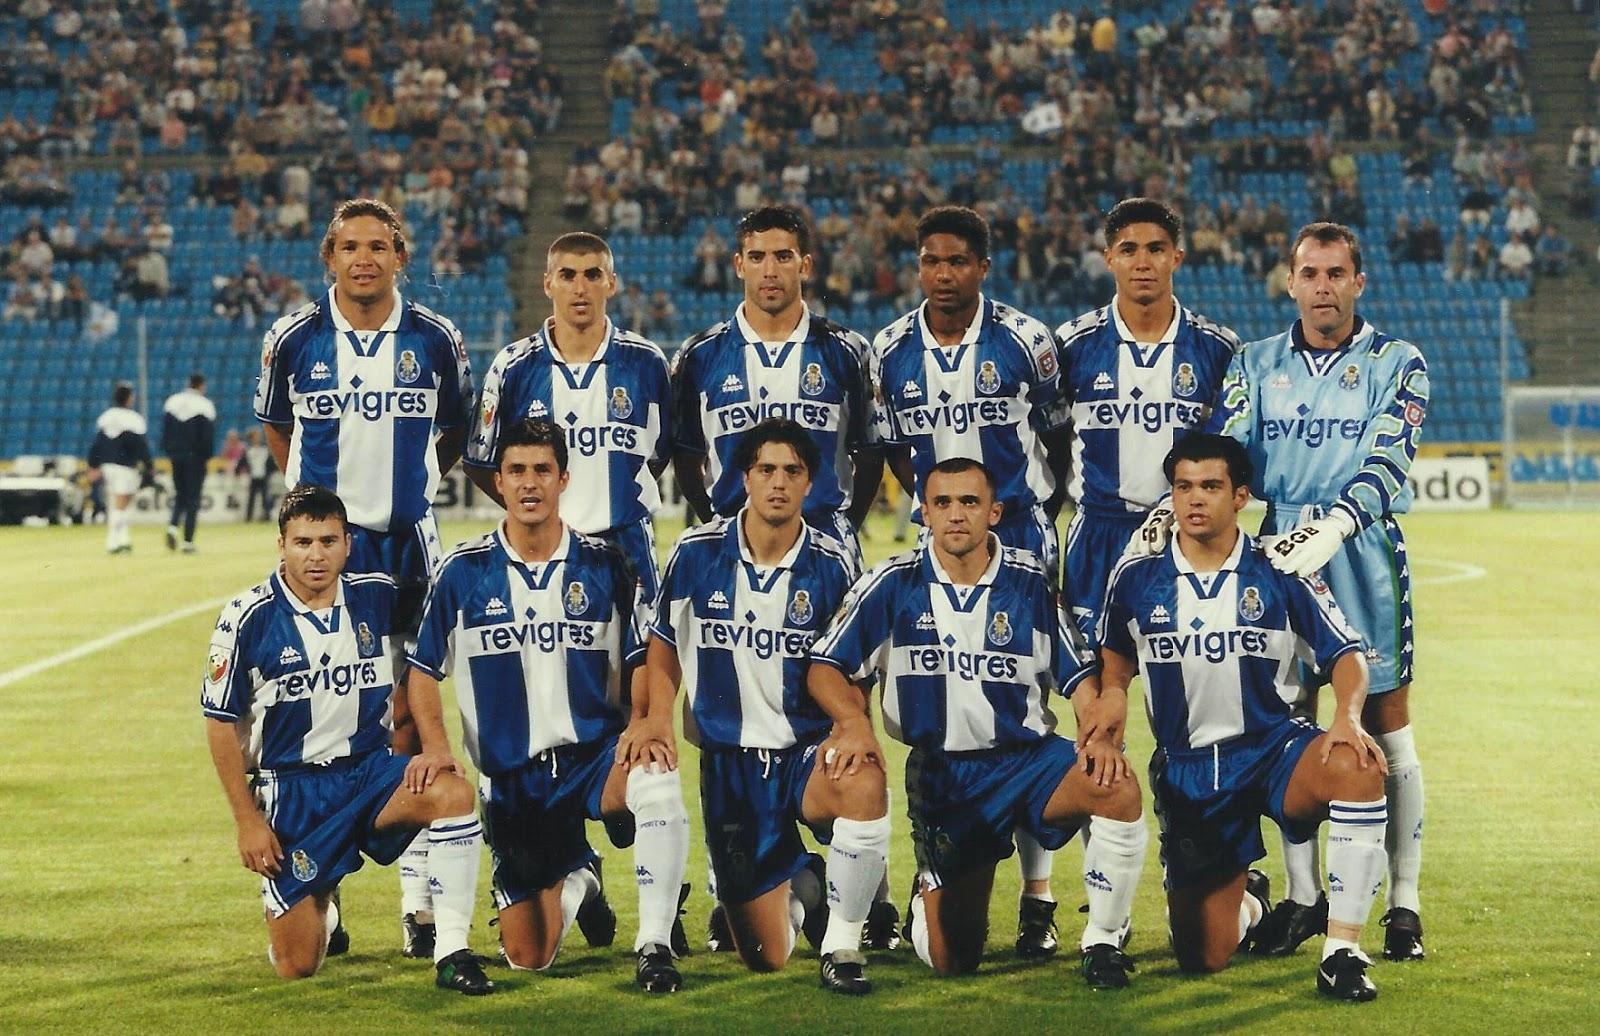 1997 Barros Vintage Porto - Garrafeira